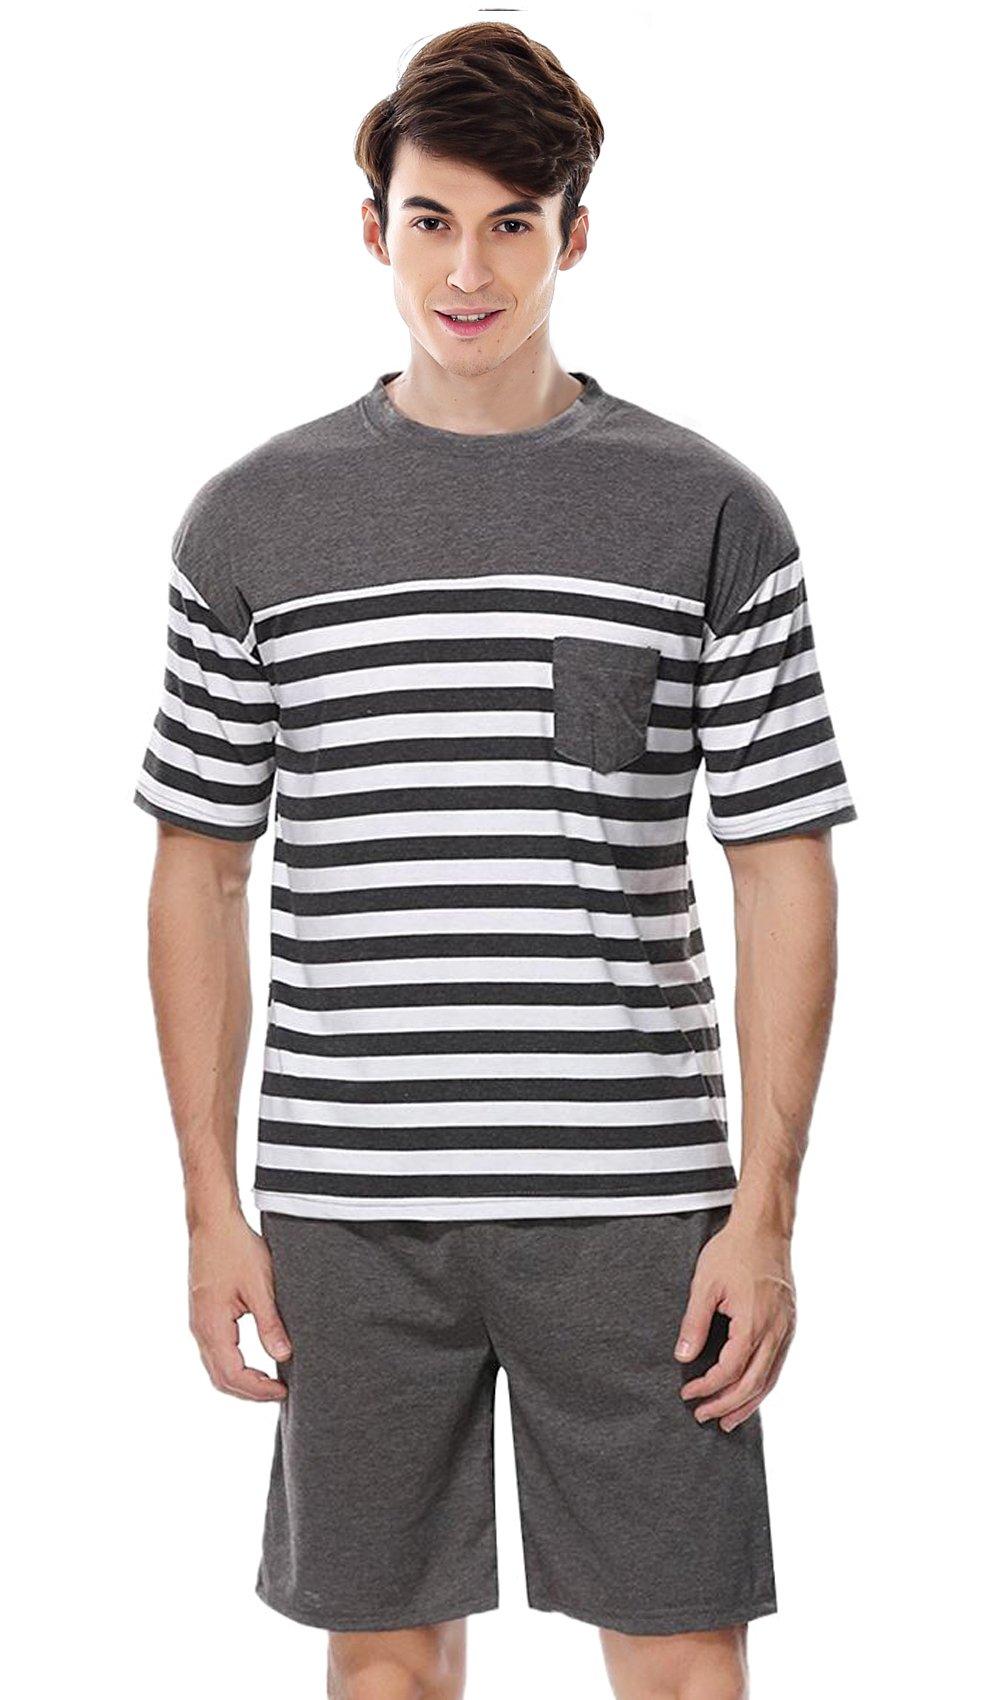 Men's Summer Sleepwear, Short Sleeve Striped Cotton Shorts and Top Pajama Set Sleep Sets Pjs